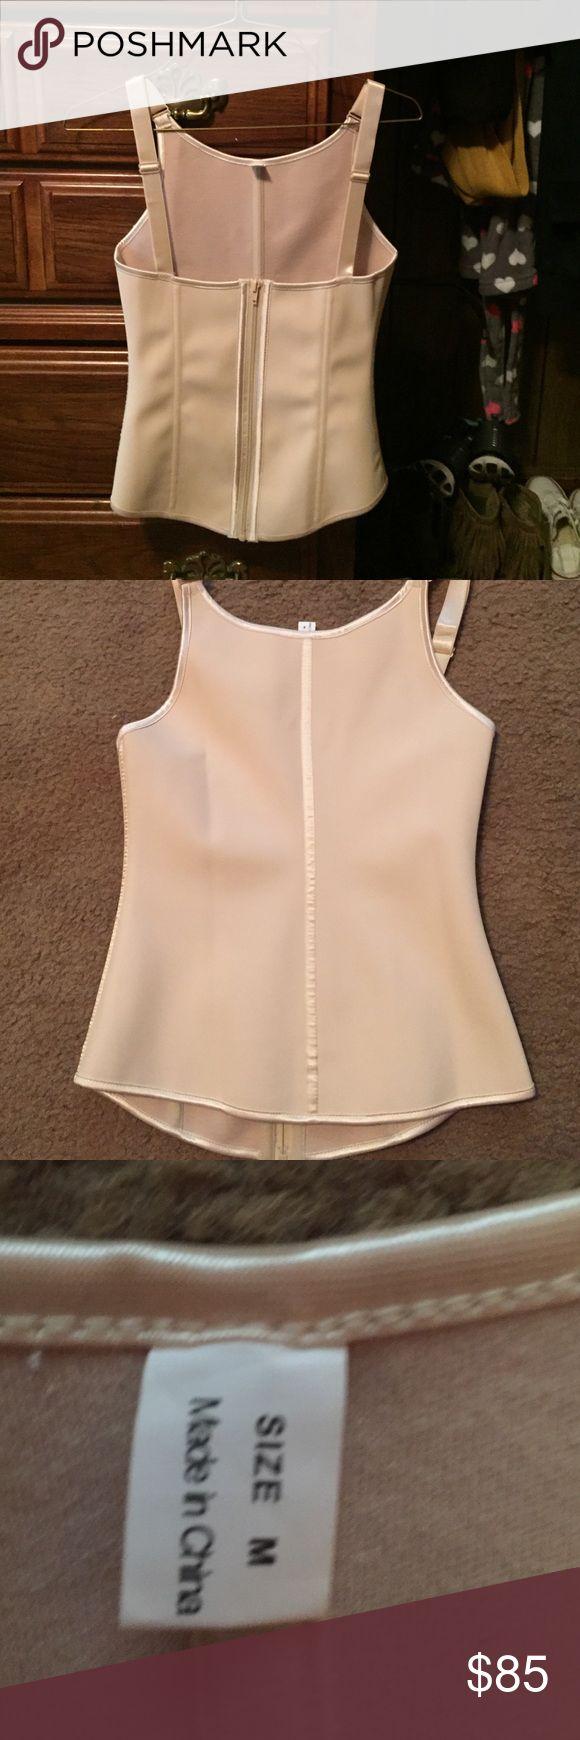 waistshaperz Medium nude zip up waist shaper never been worn. I purchased this through waistshaperz but was too small. Intimates & Sleepwear Shapewear